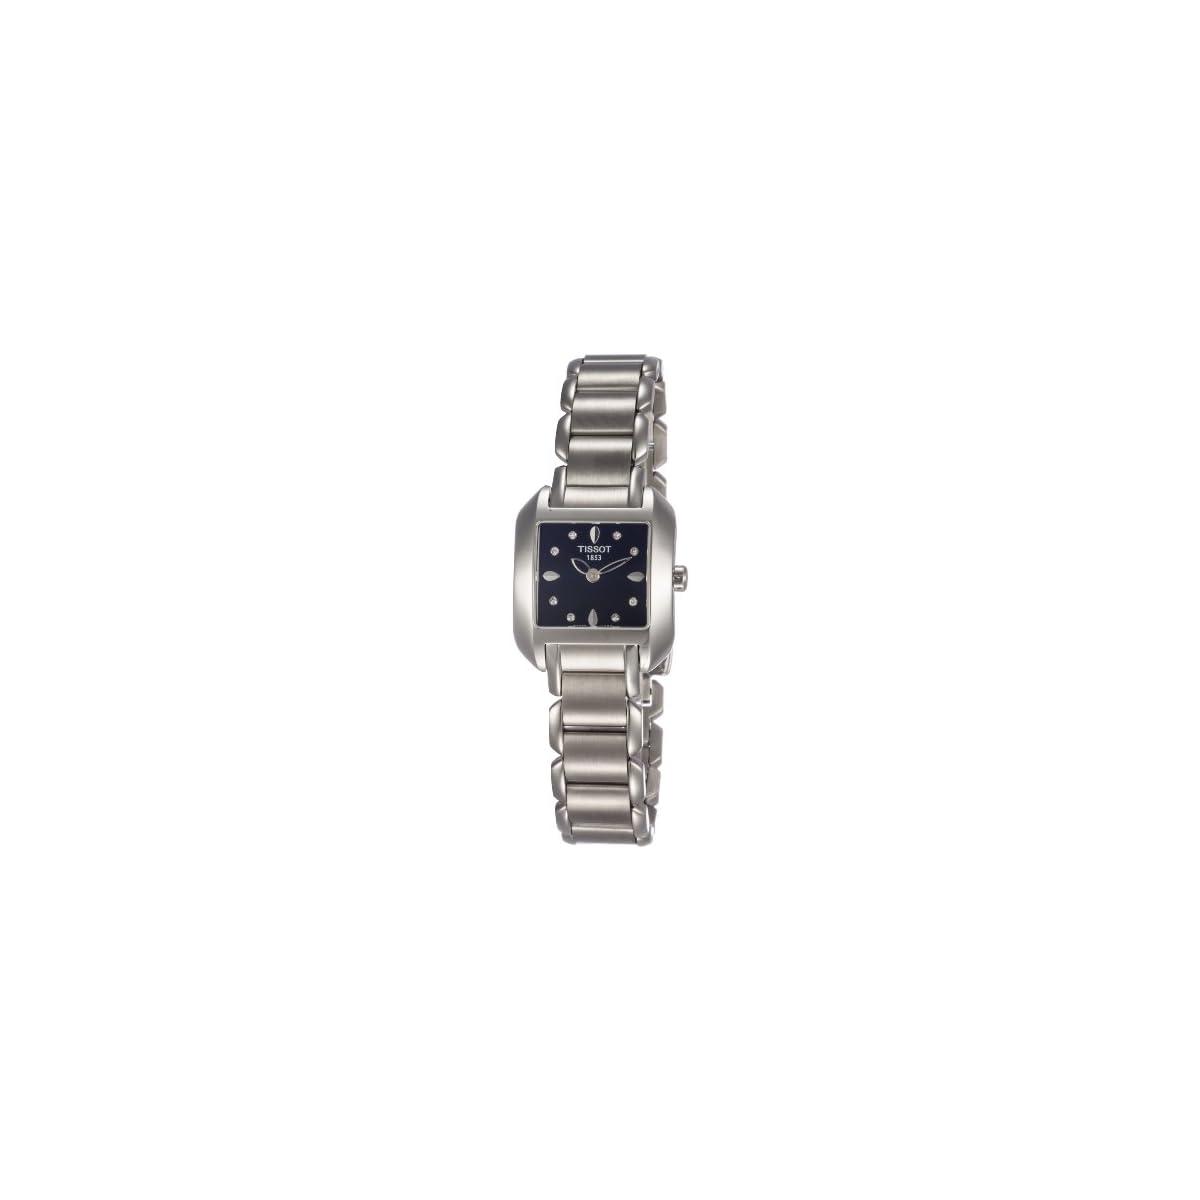 41VoJAMAl7L. SS1200  - Tissot T-Wave T02128554 - Reloj de Mujer de Cuarzo, Correa de Acero Inoxidable Color Gris